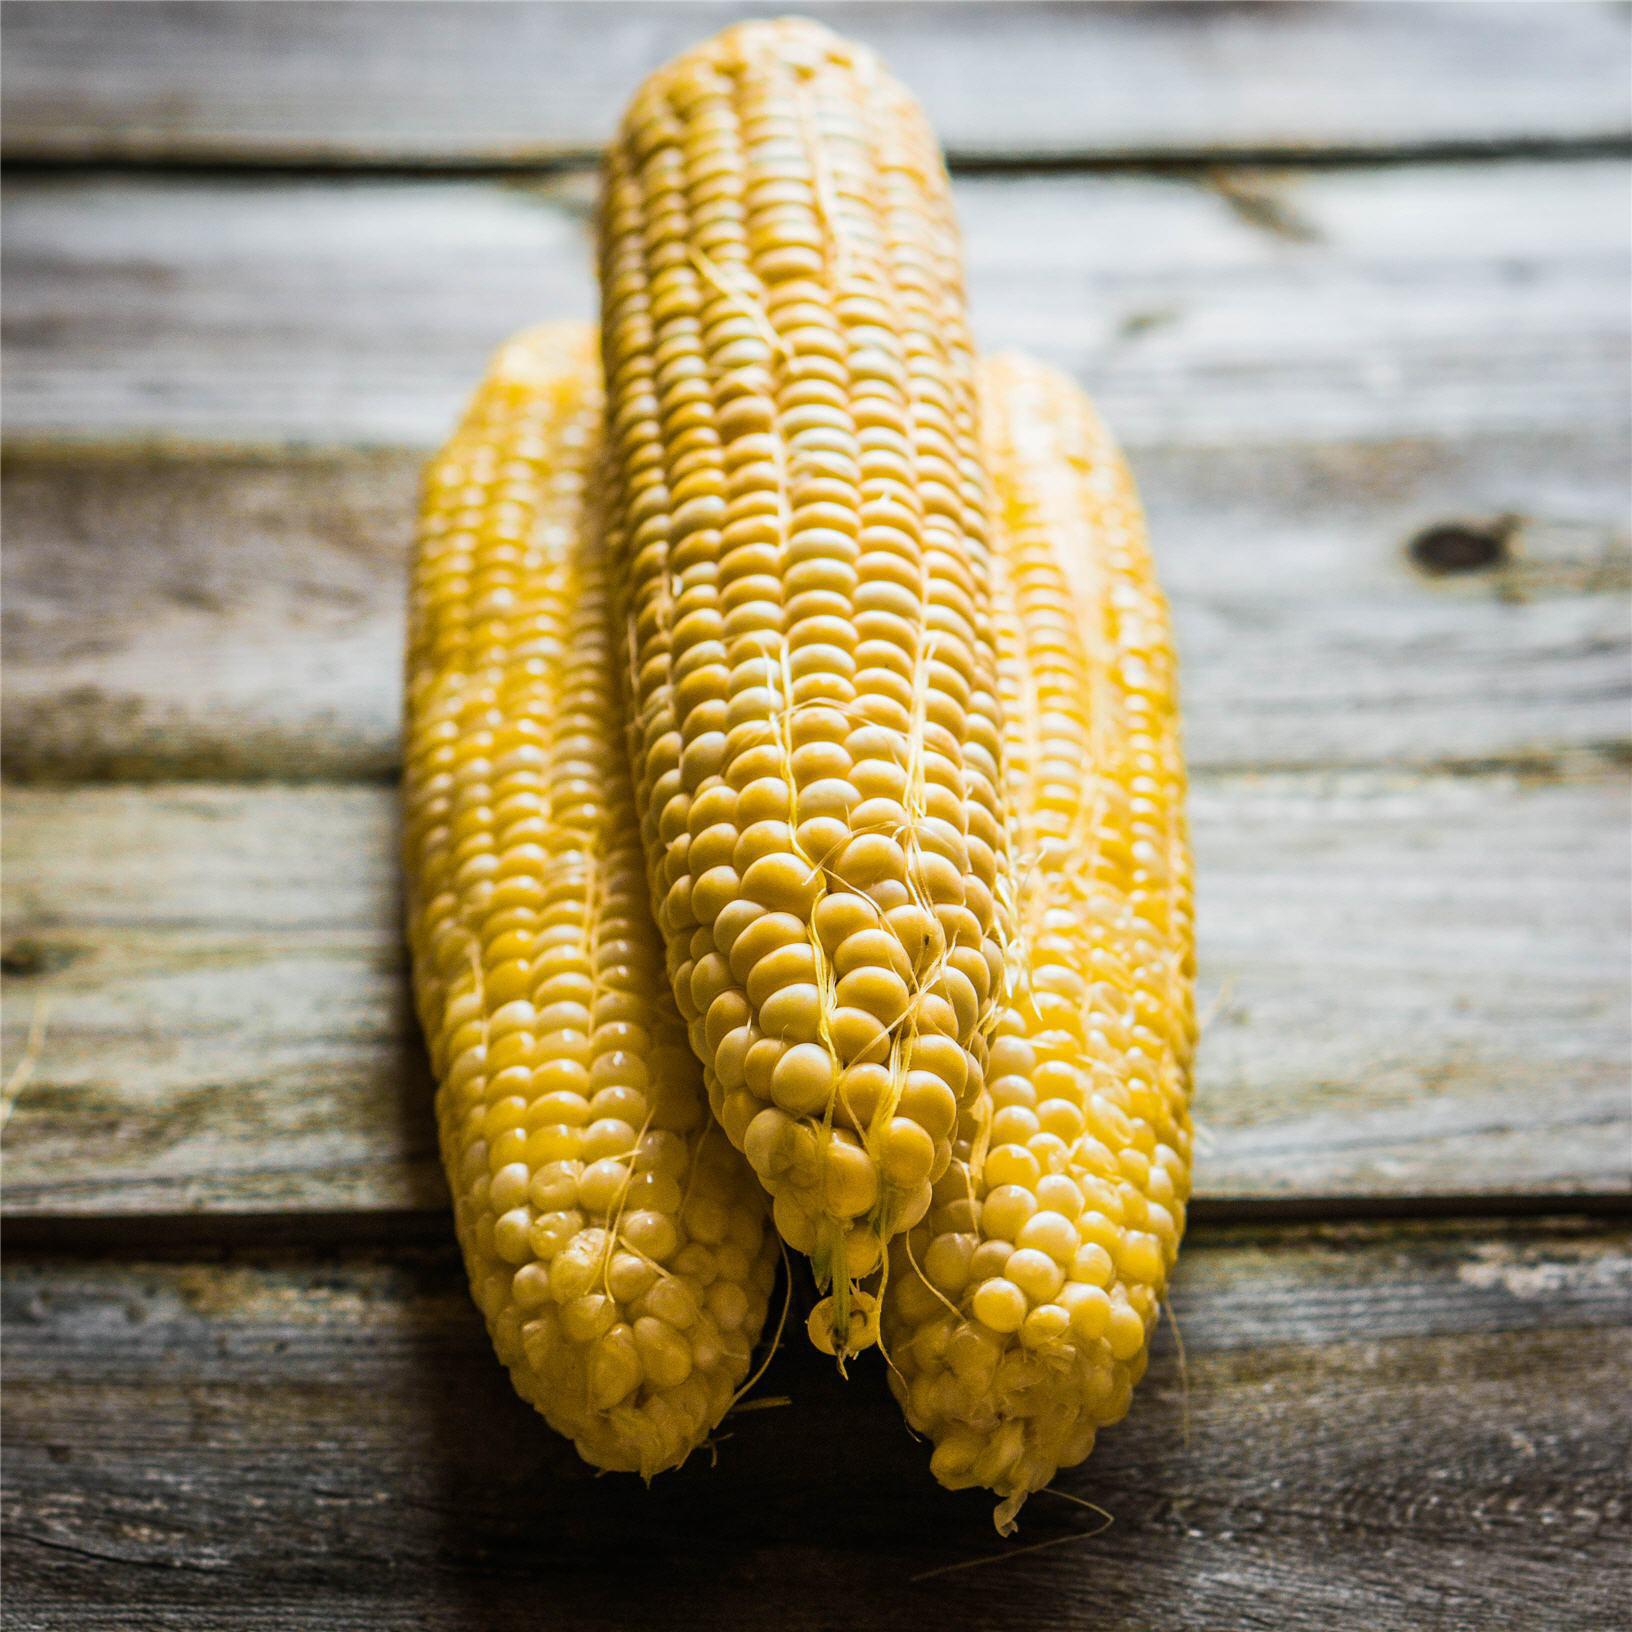 corn, corn on the cob